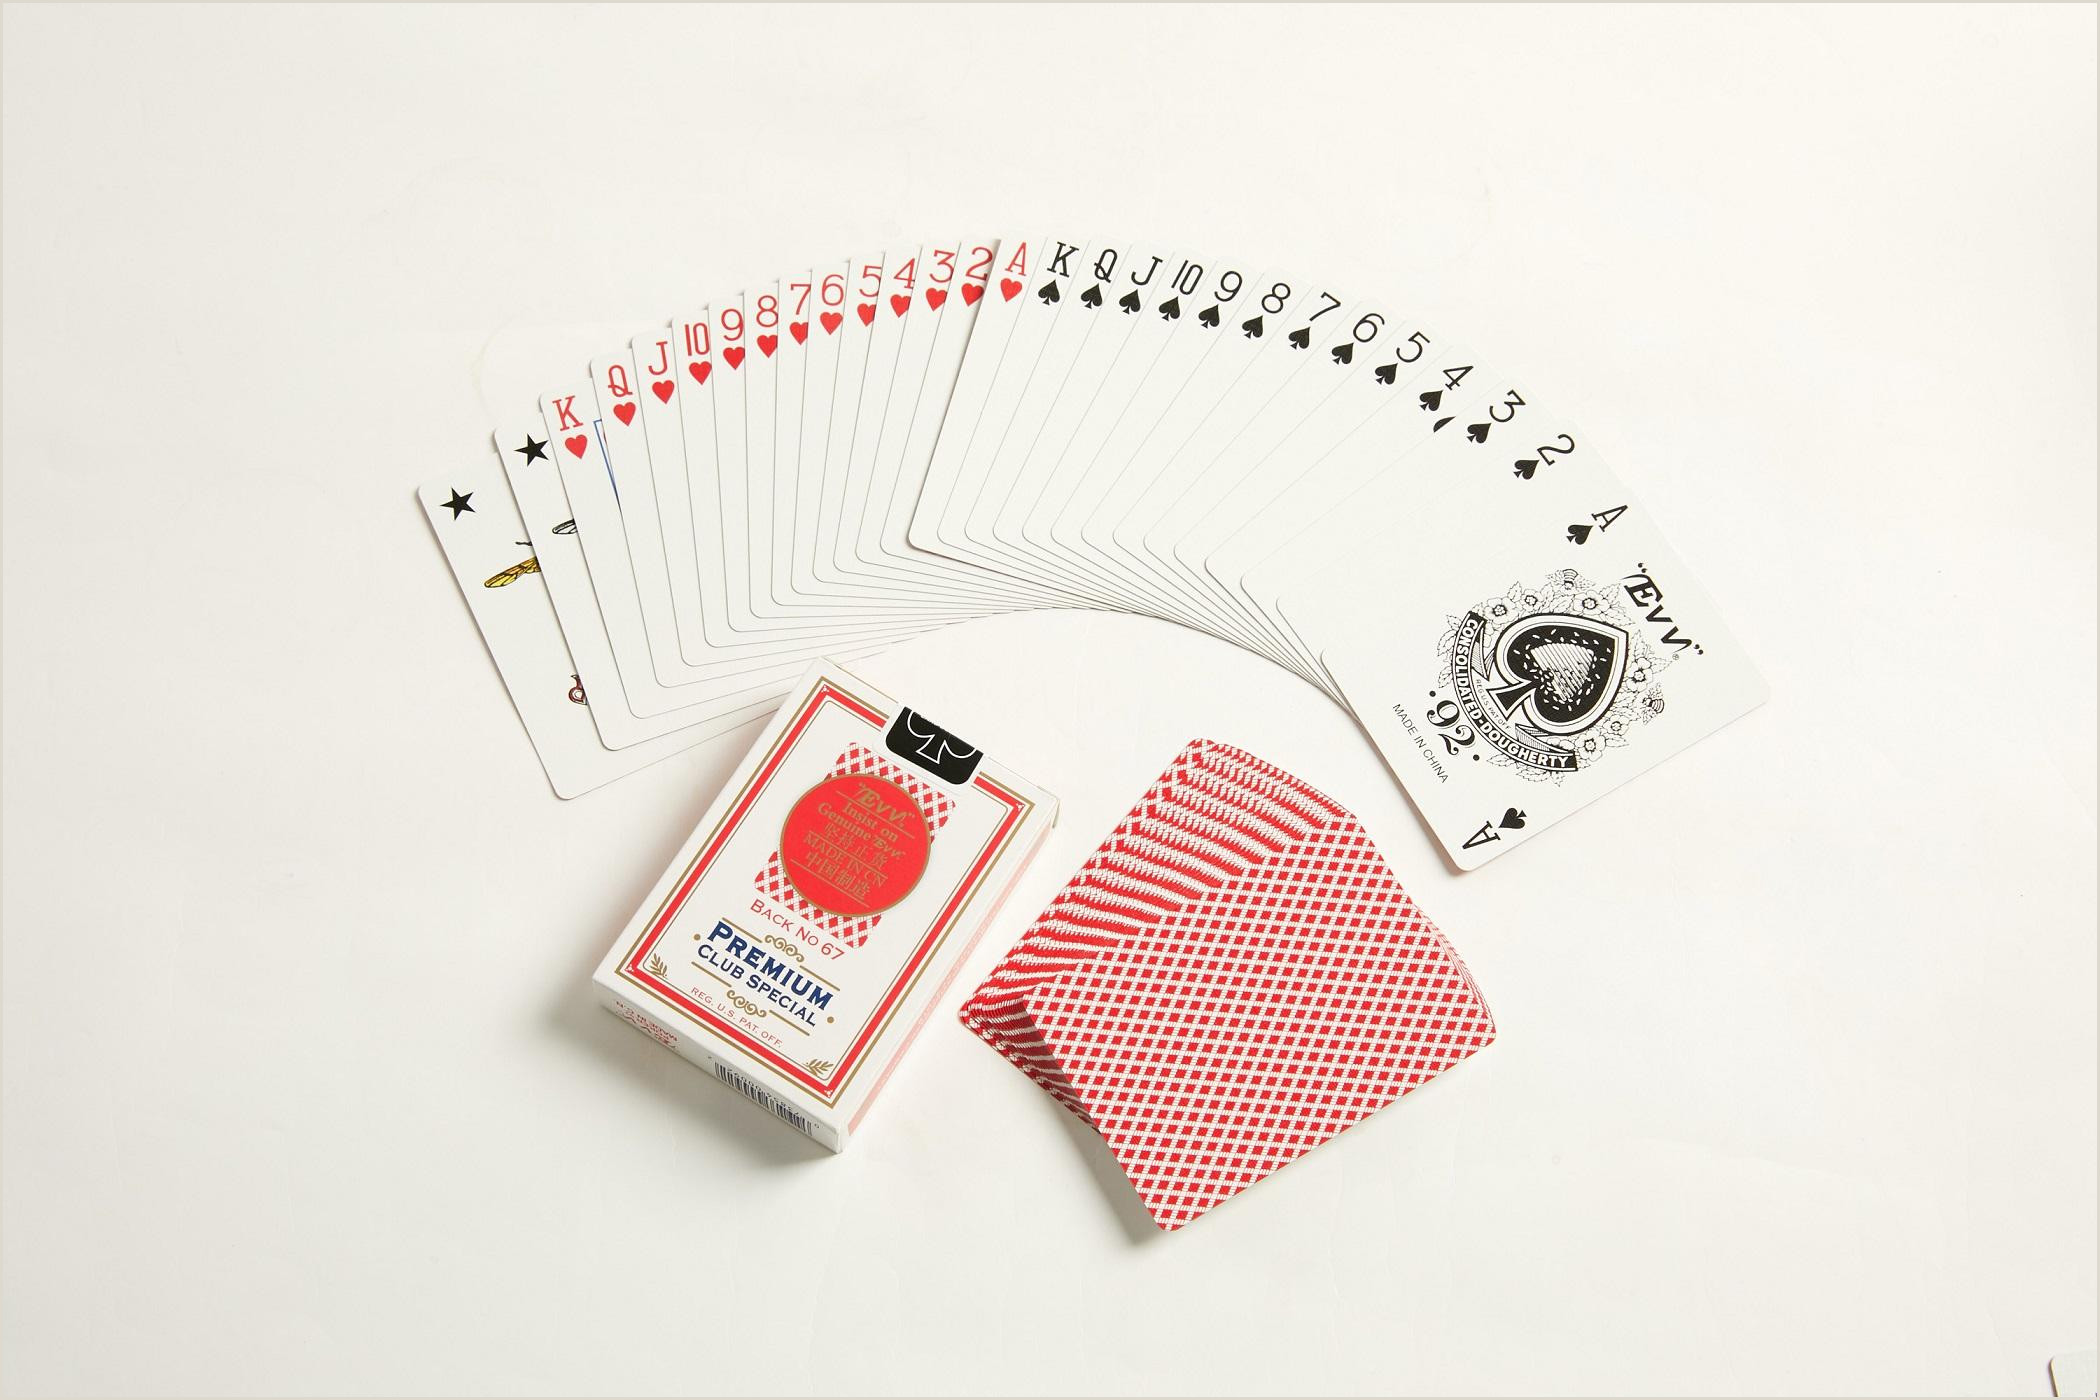 Customized Playing Cards No Minimum High Quality Custom Playing Cards Cheap High Quality Custom